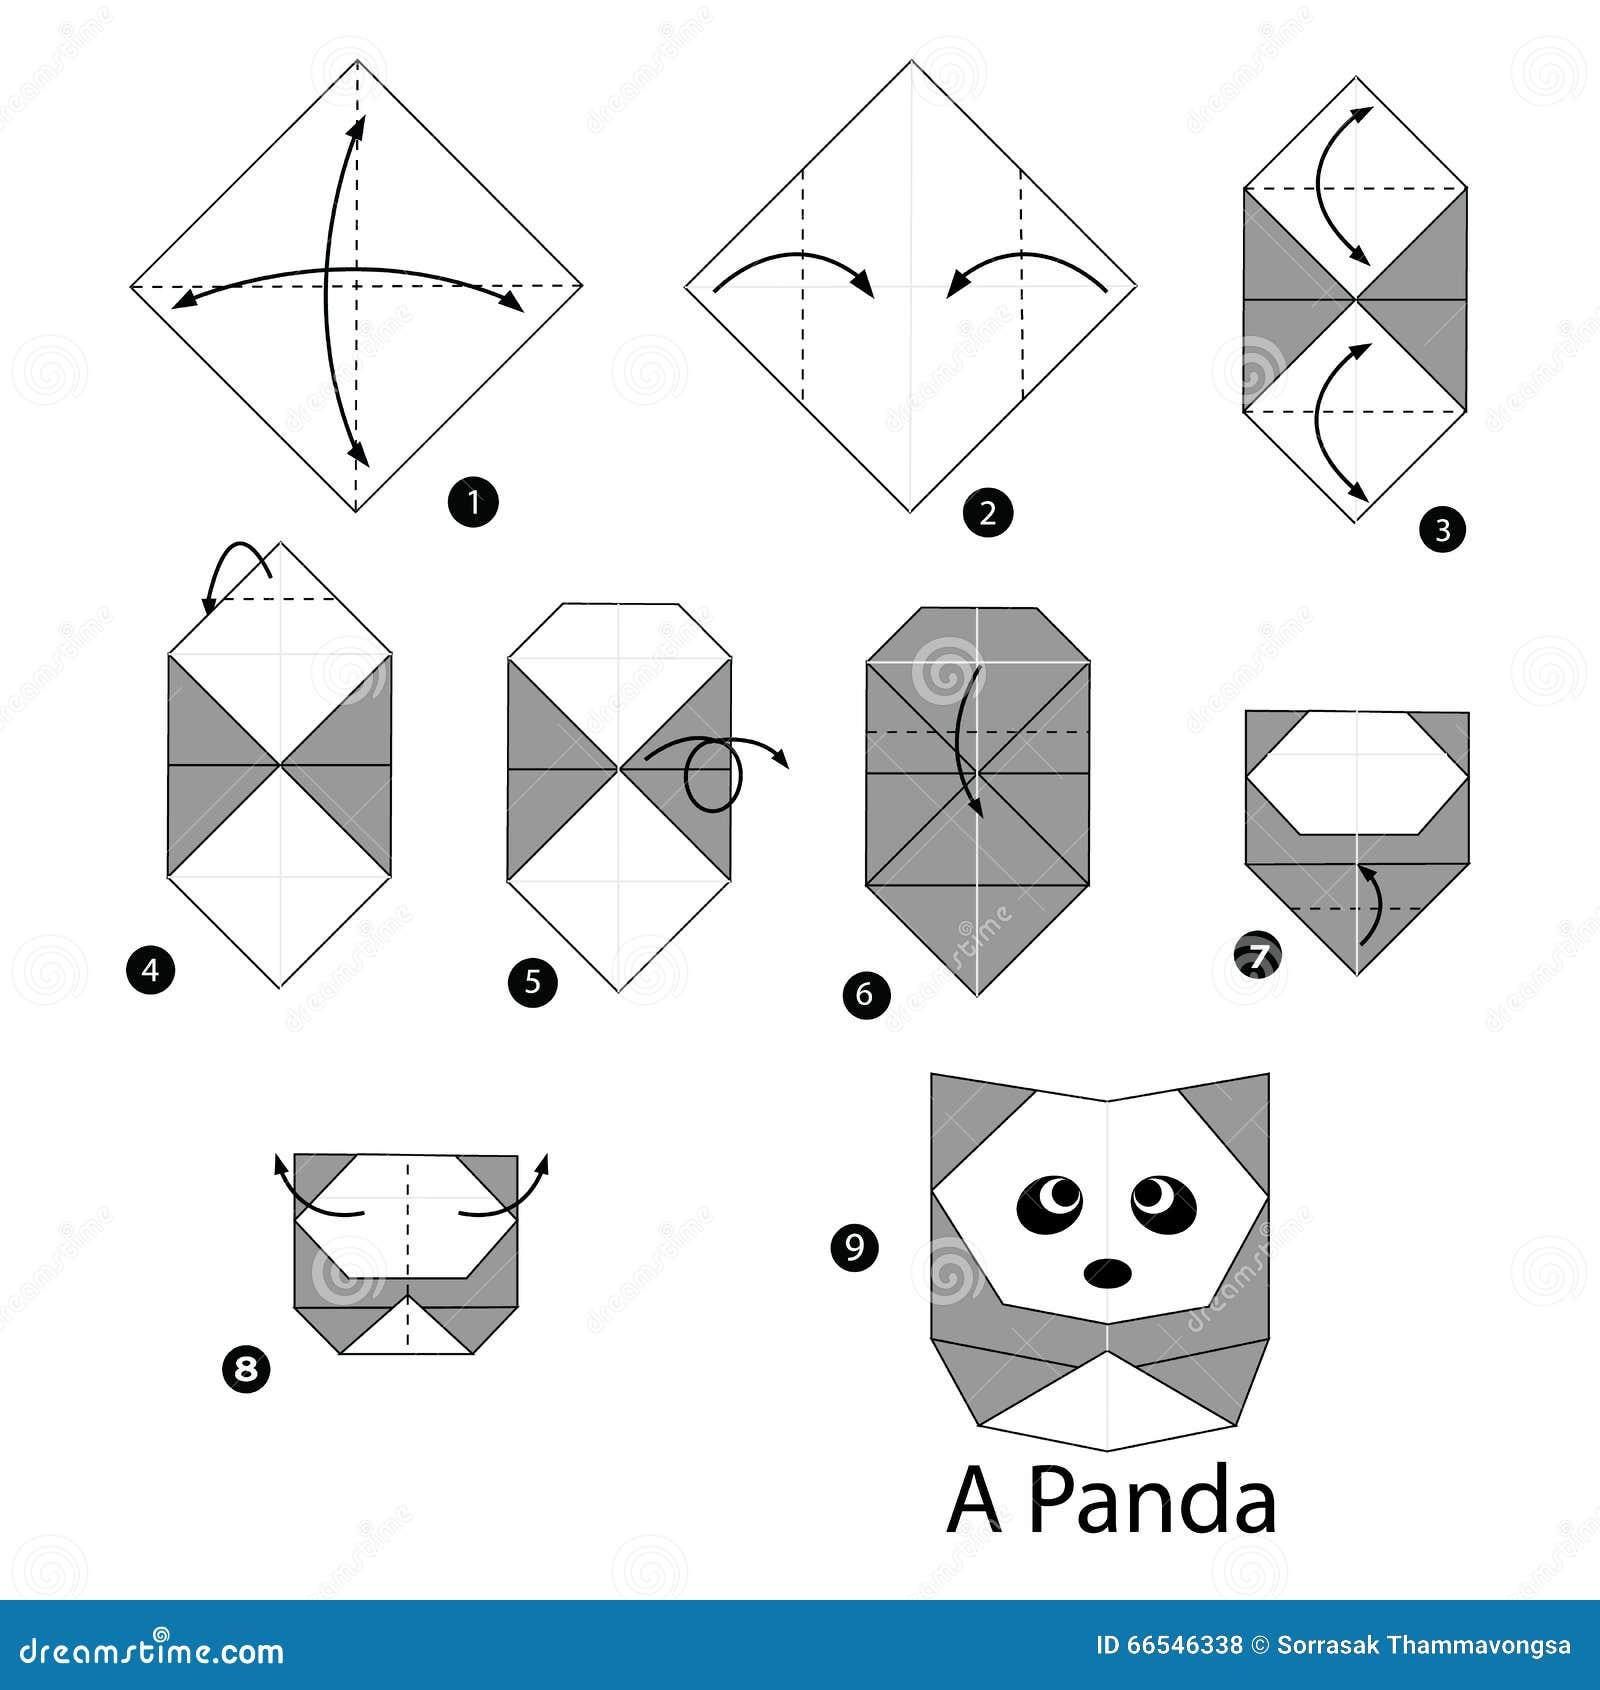 blender 2.7 manuel francais pdf